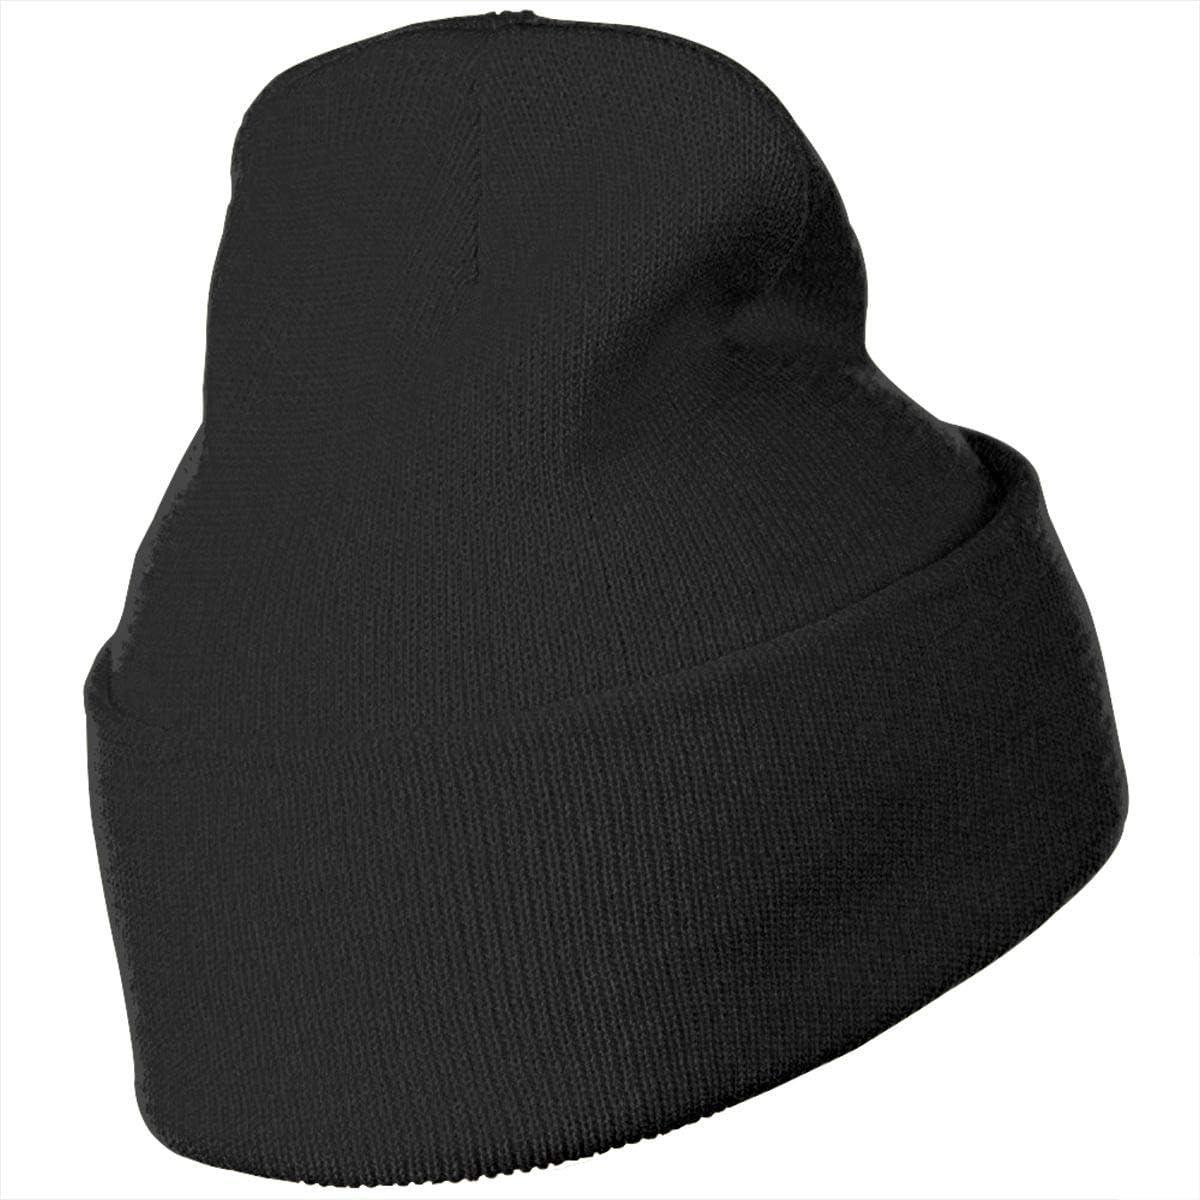 Smoking Skull Unisex Knitted Hat Beanie Hat Warm Hats Skull Cap